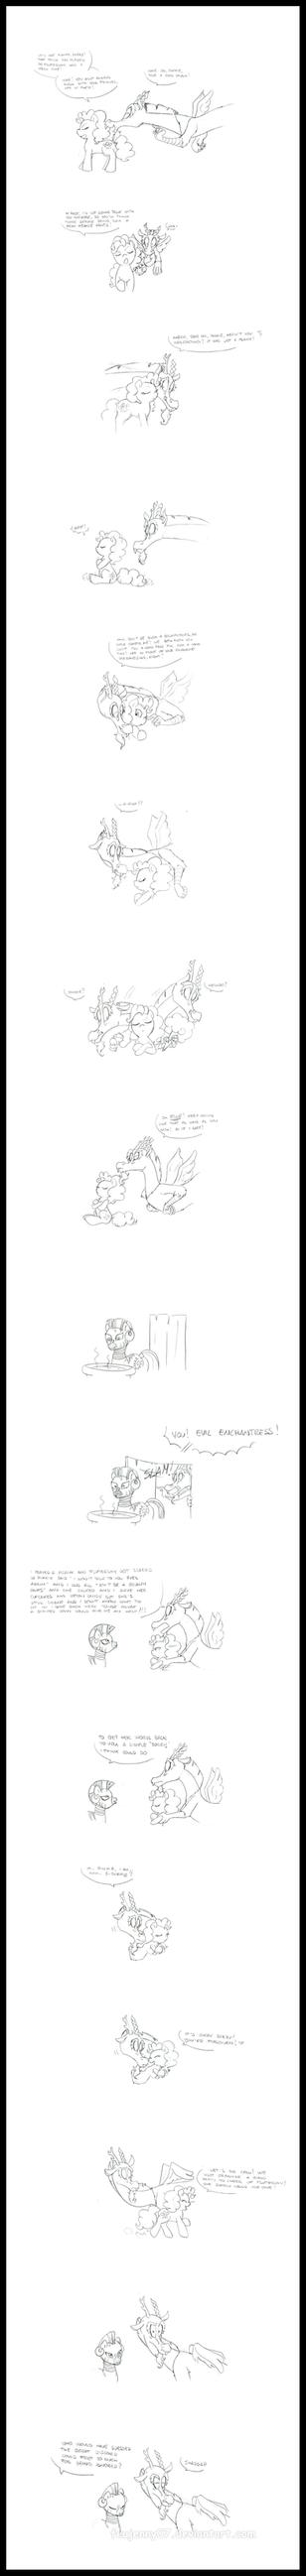 Pinkie's Pout - Comic by FEuJenny07